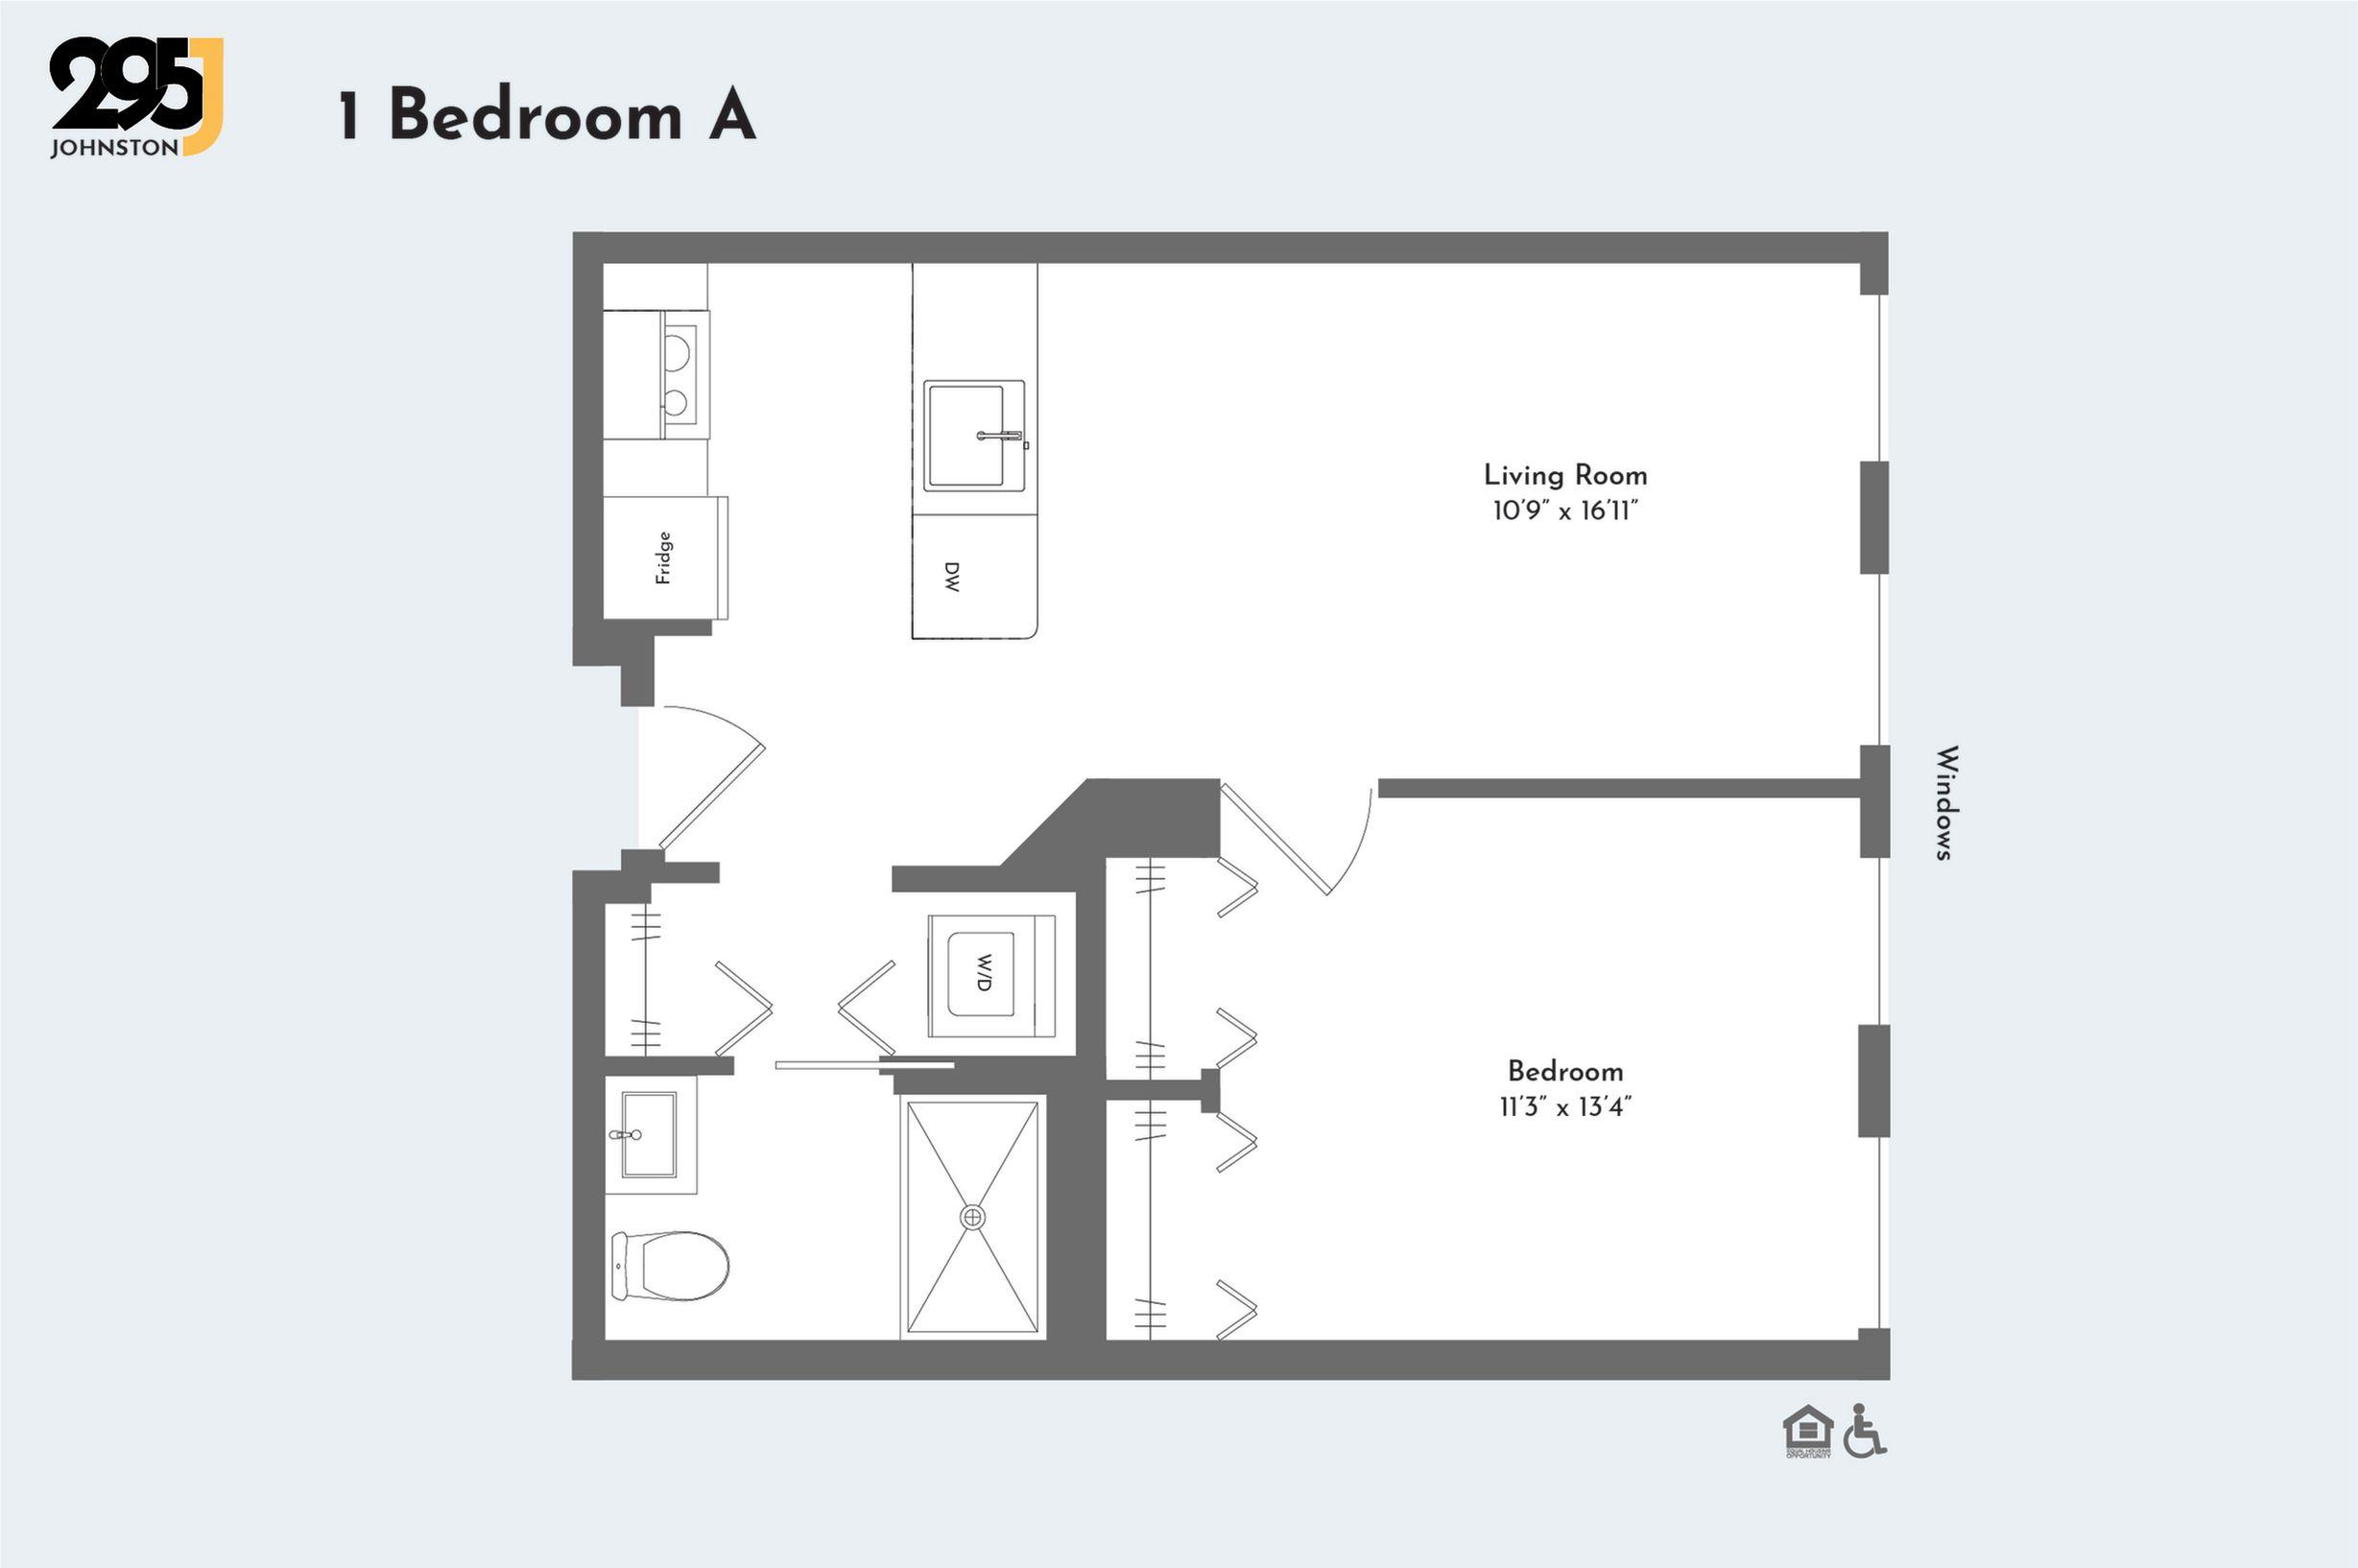 1 Bedroom A floorplan